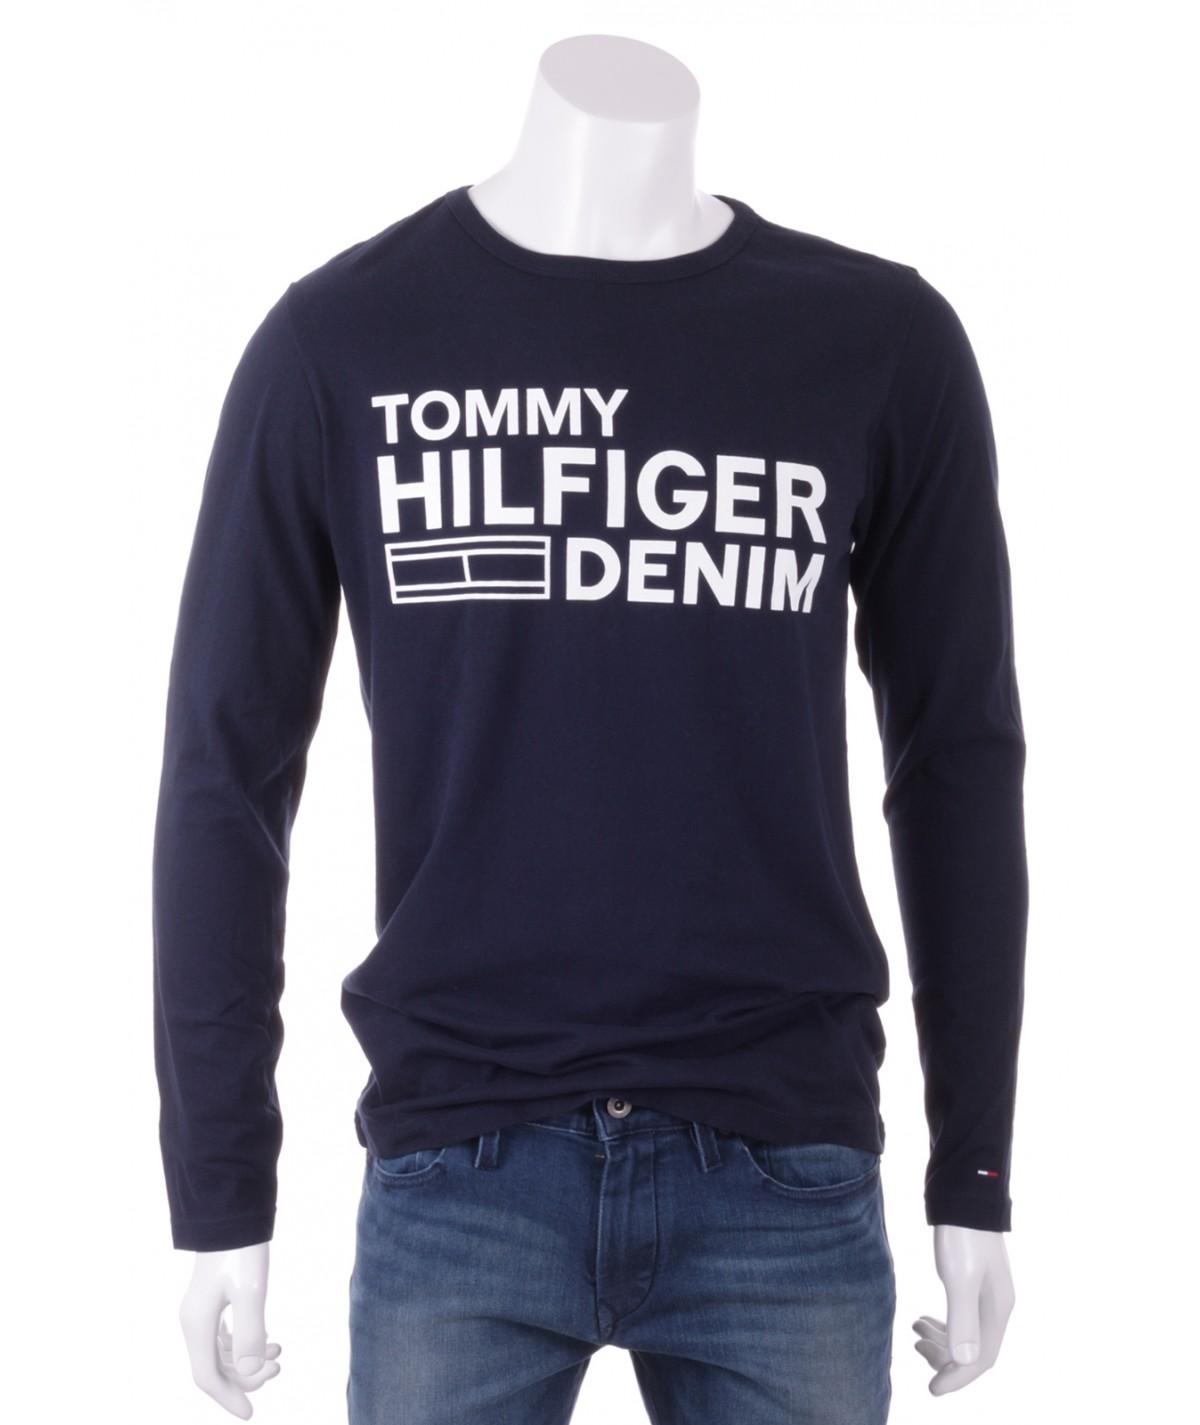 TOMMY HILFIGER T-Shirt Uomo